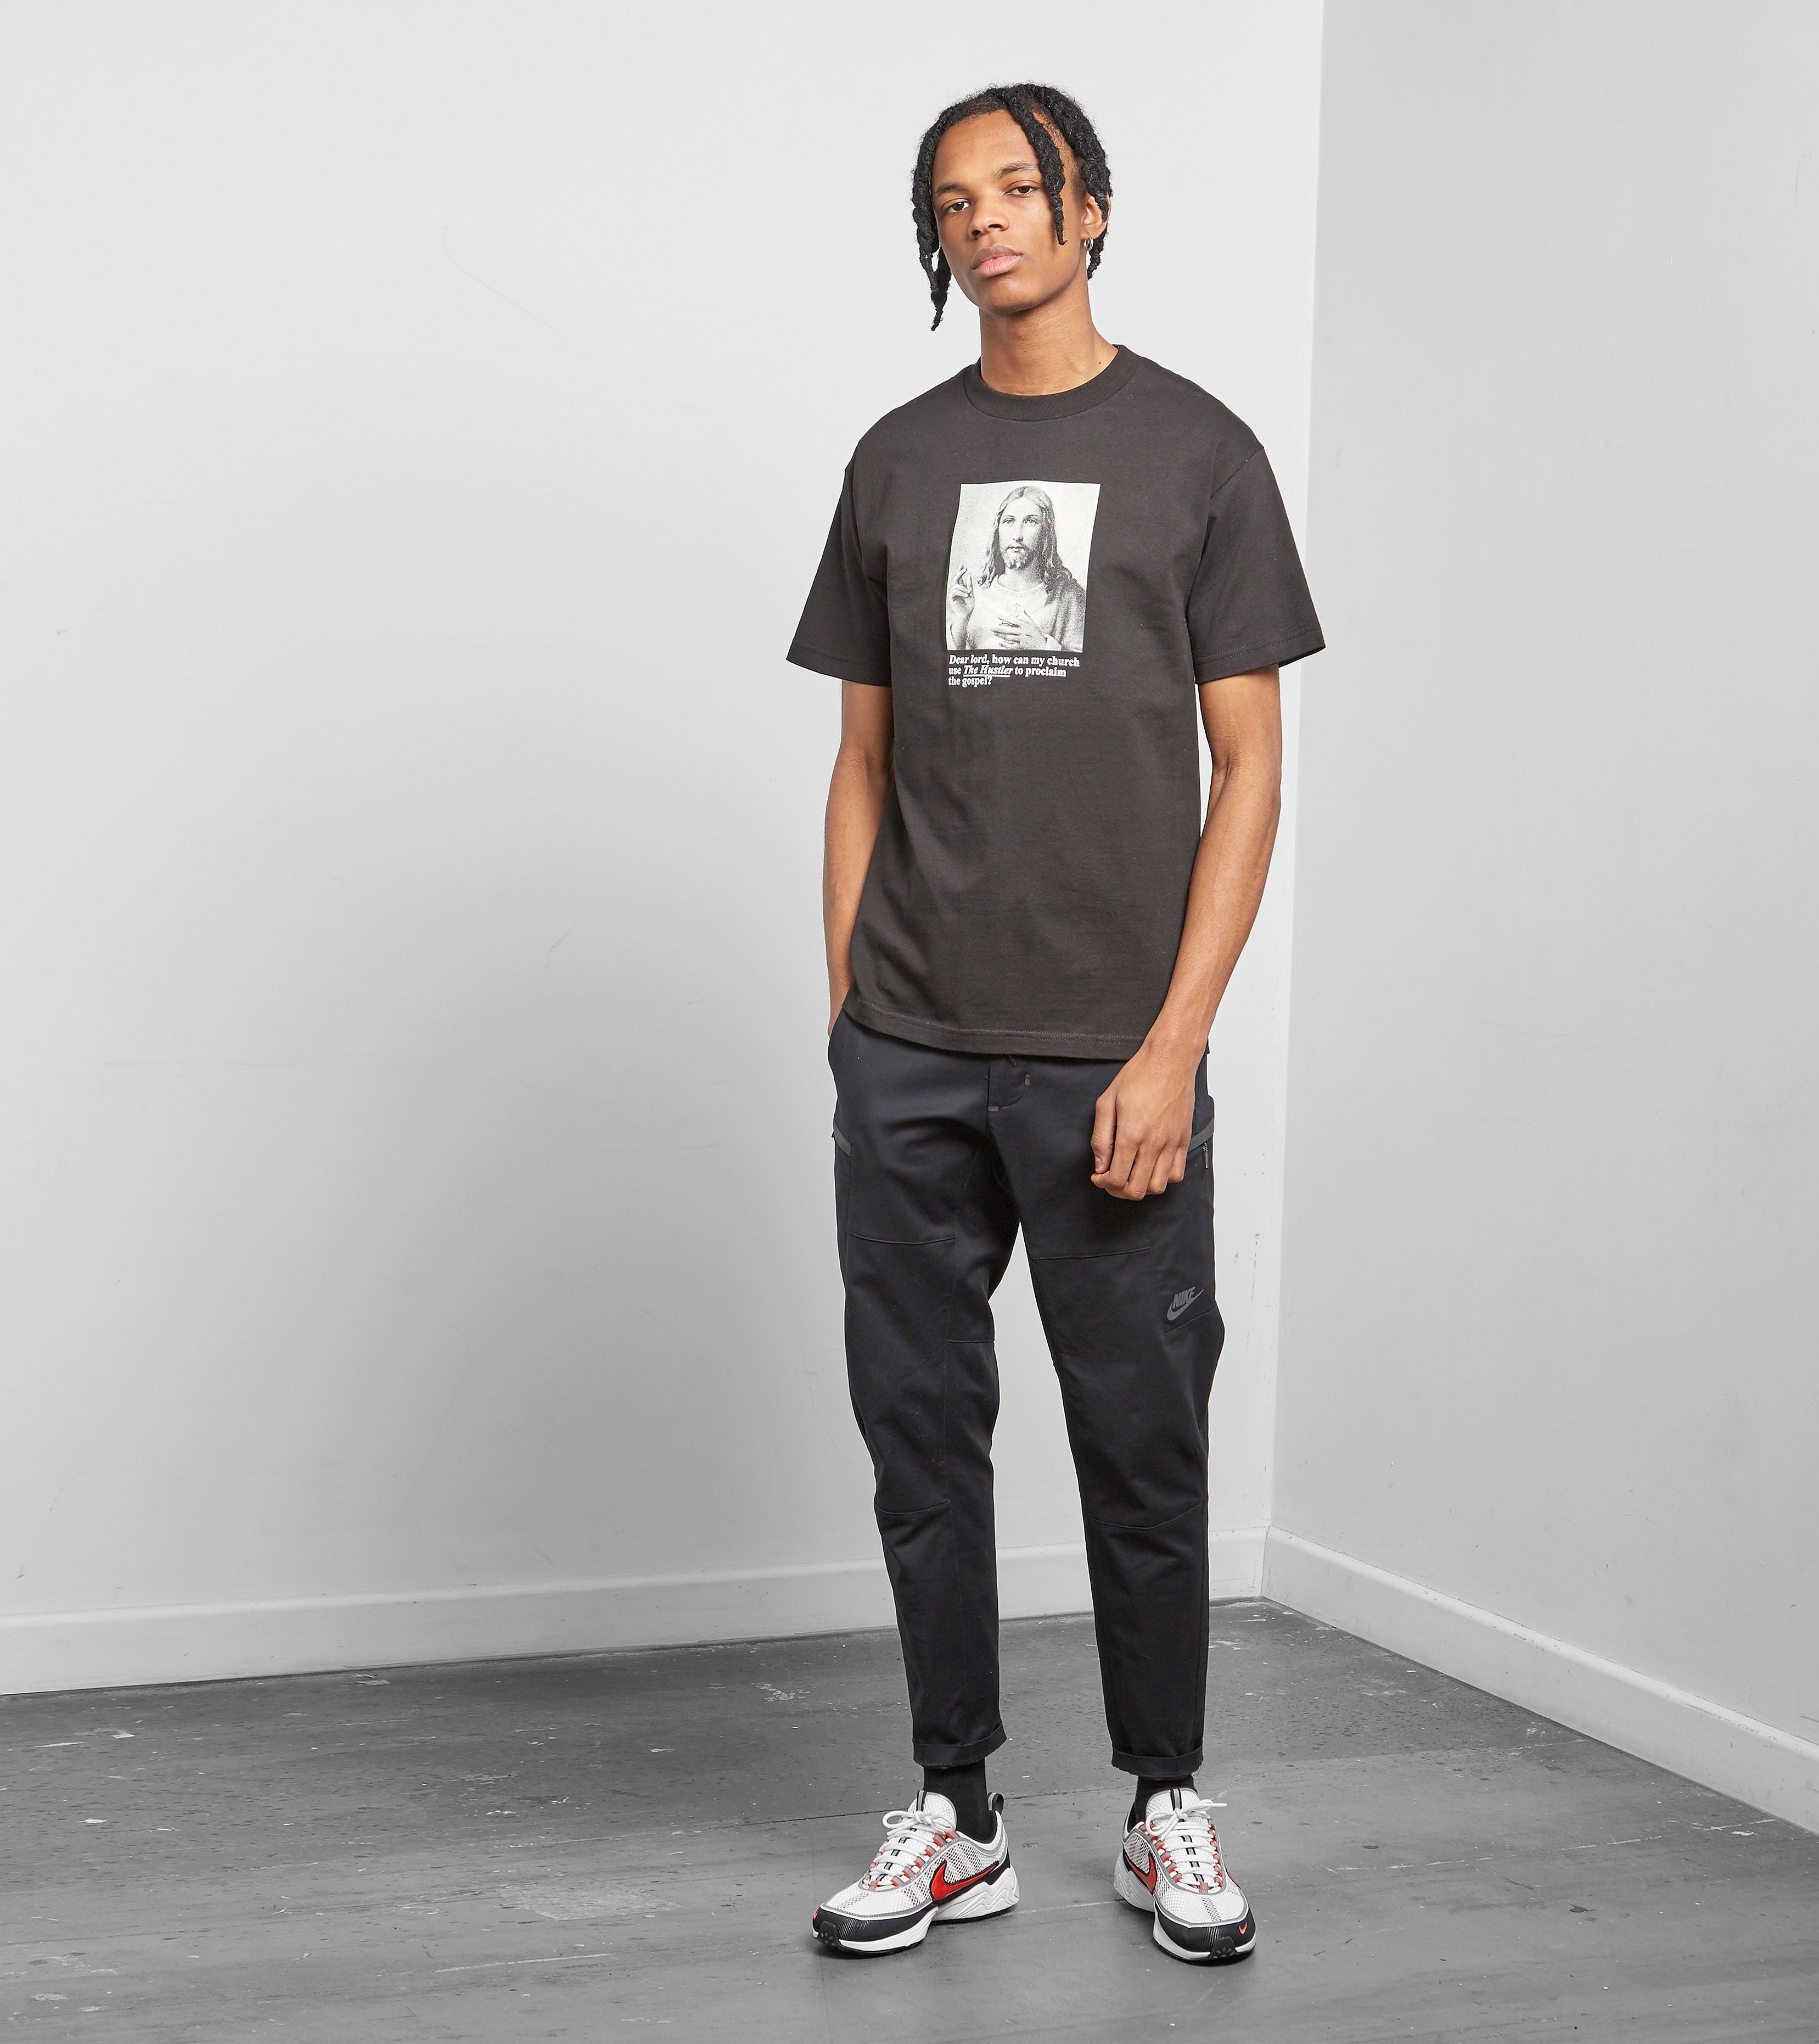 Foulplay Hustler T-Shirt